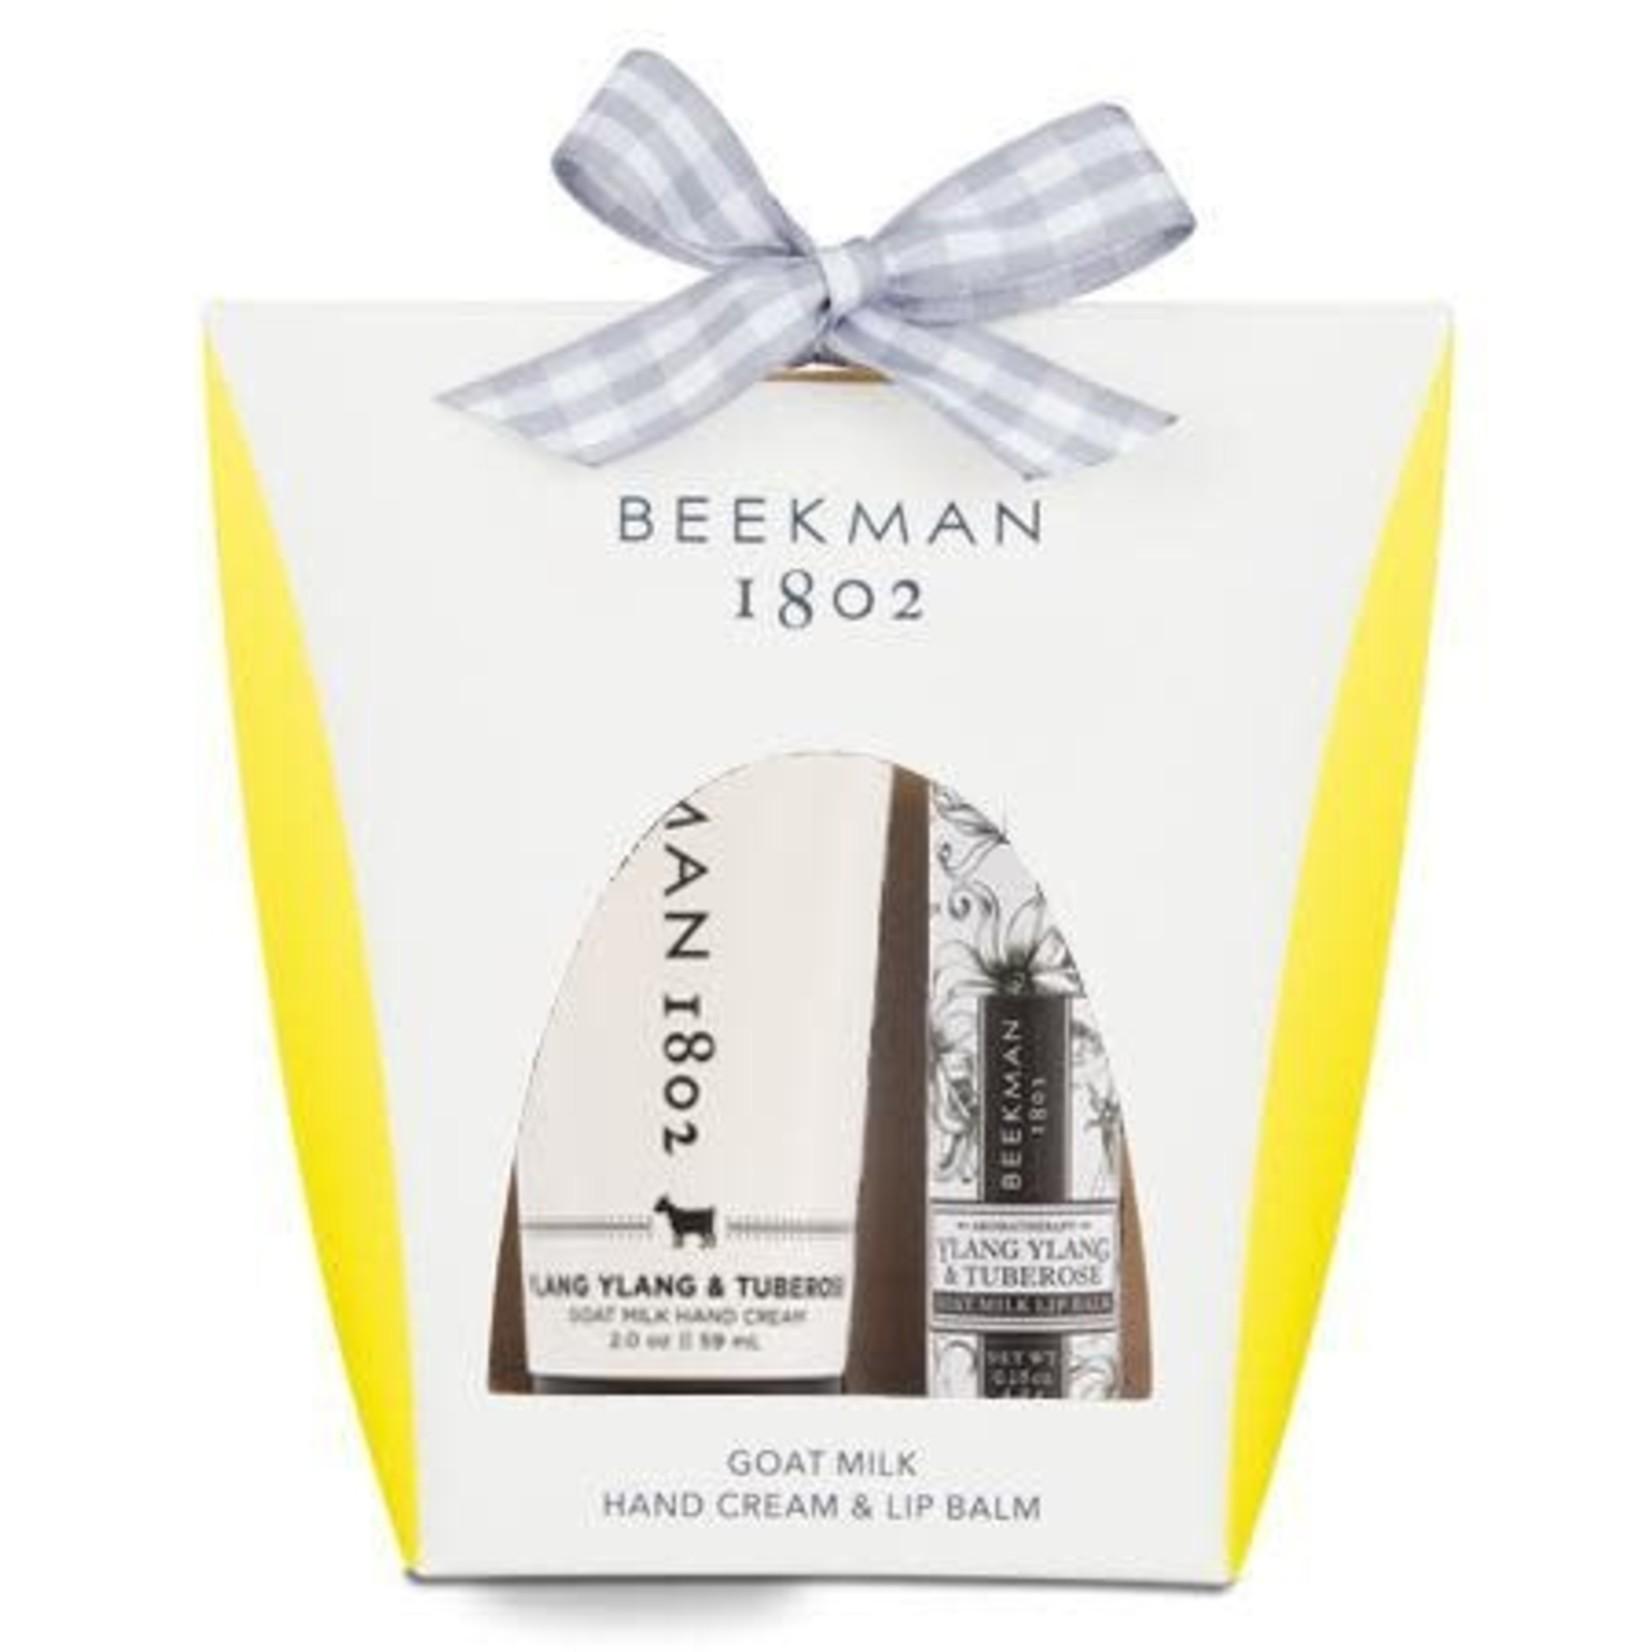 BEEKMAN 1802 Ylang Ylang & Tuberose Hand & Lip Hydration Kit